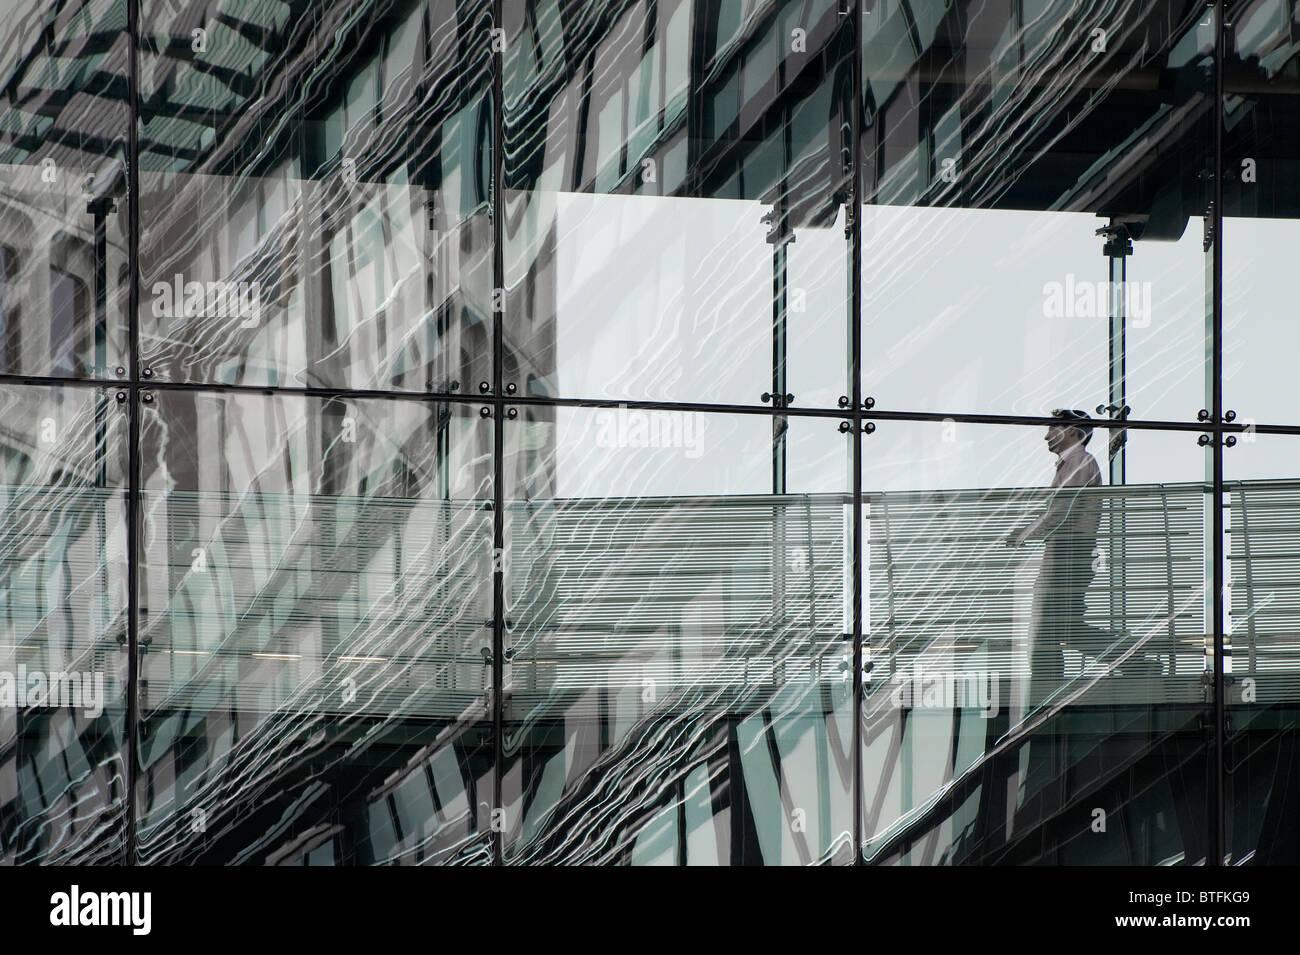 moderne zeitgenössische gläserne Bürogebäude, London, england Stockbild